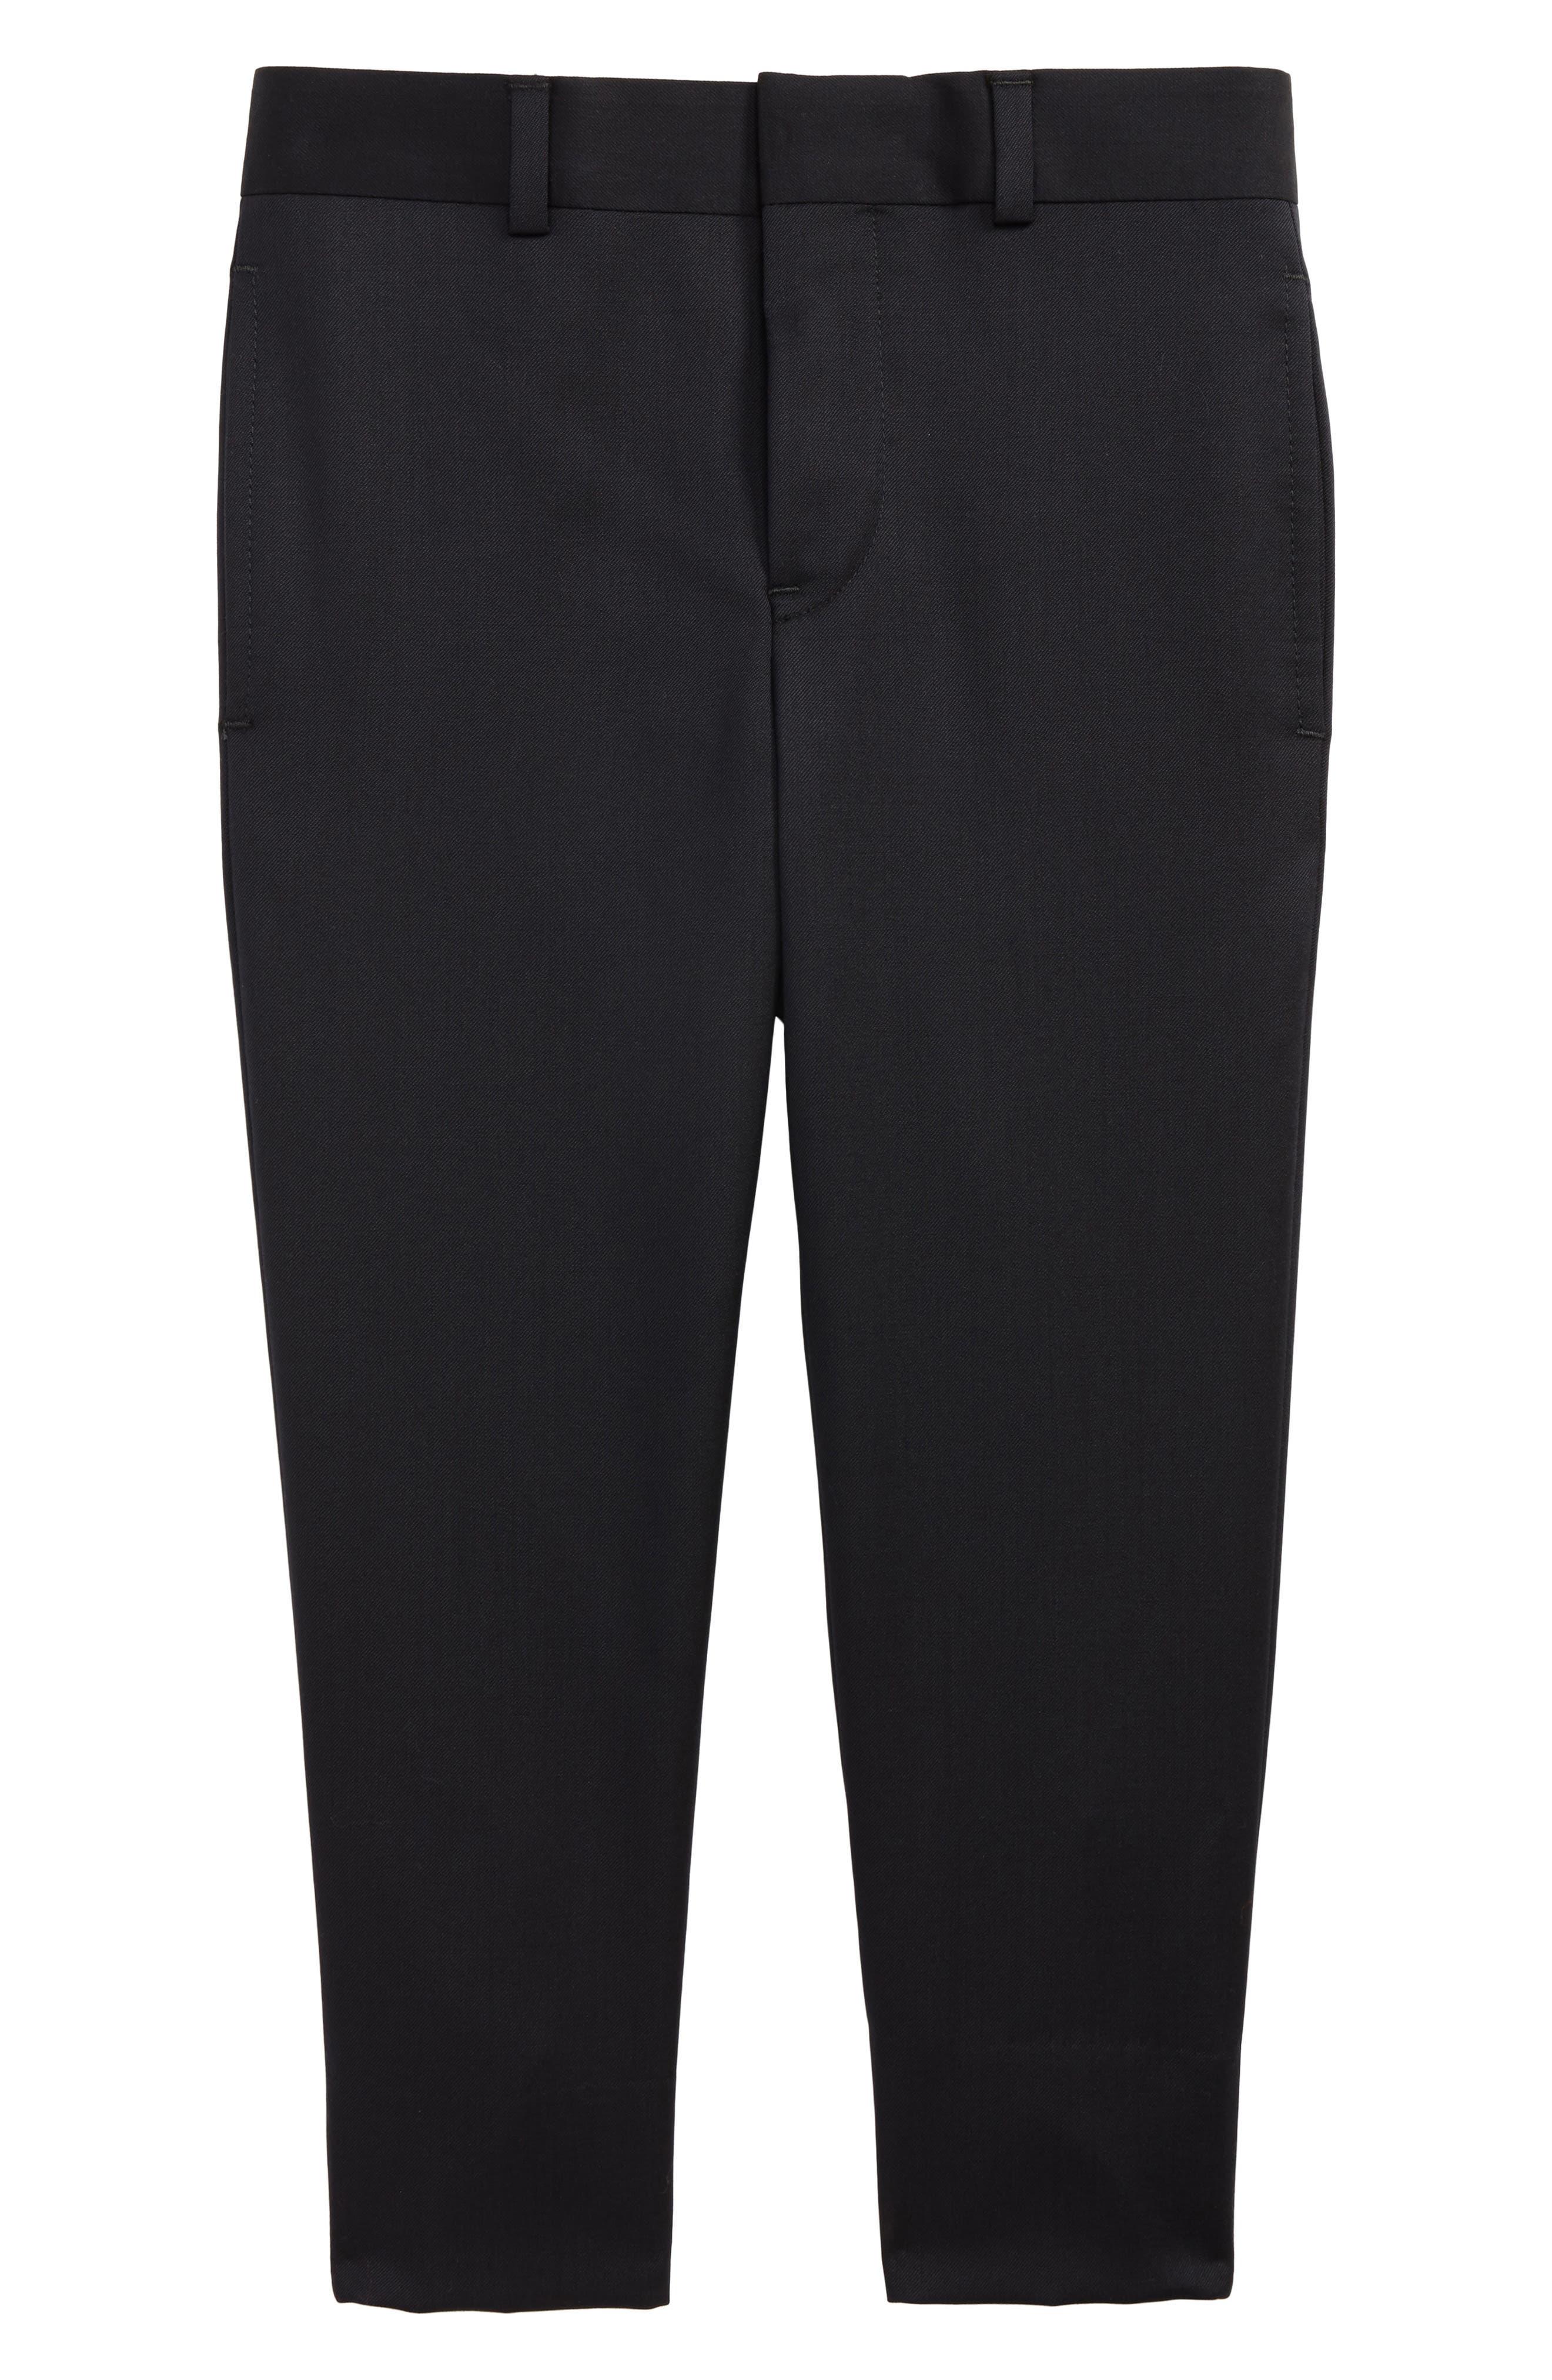 Main Image - JB Jr Flat Front Trousers (Little Boys & Big Boys)